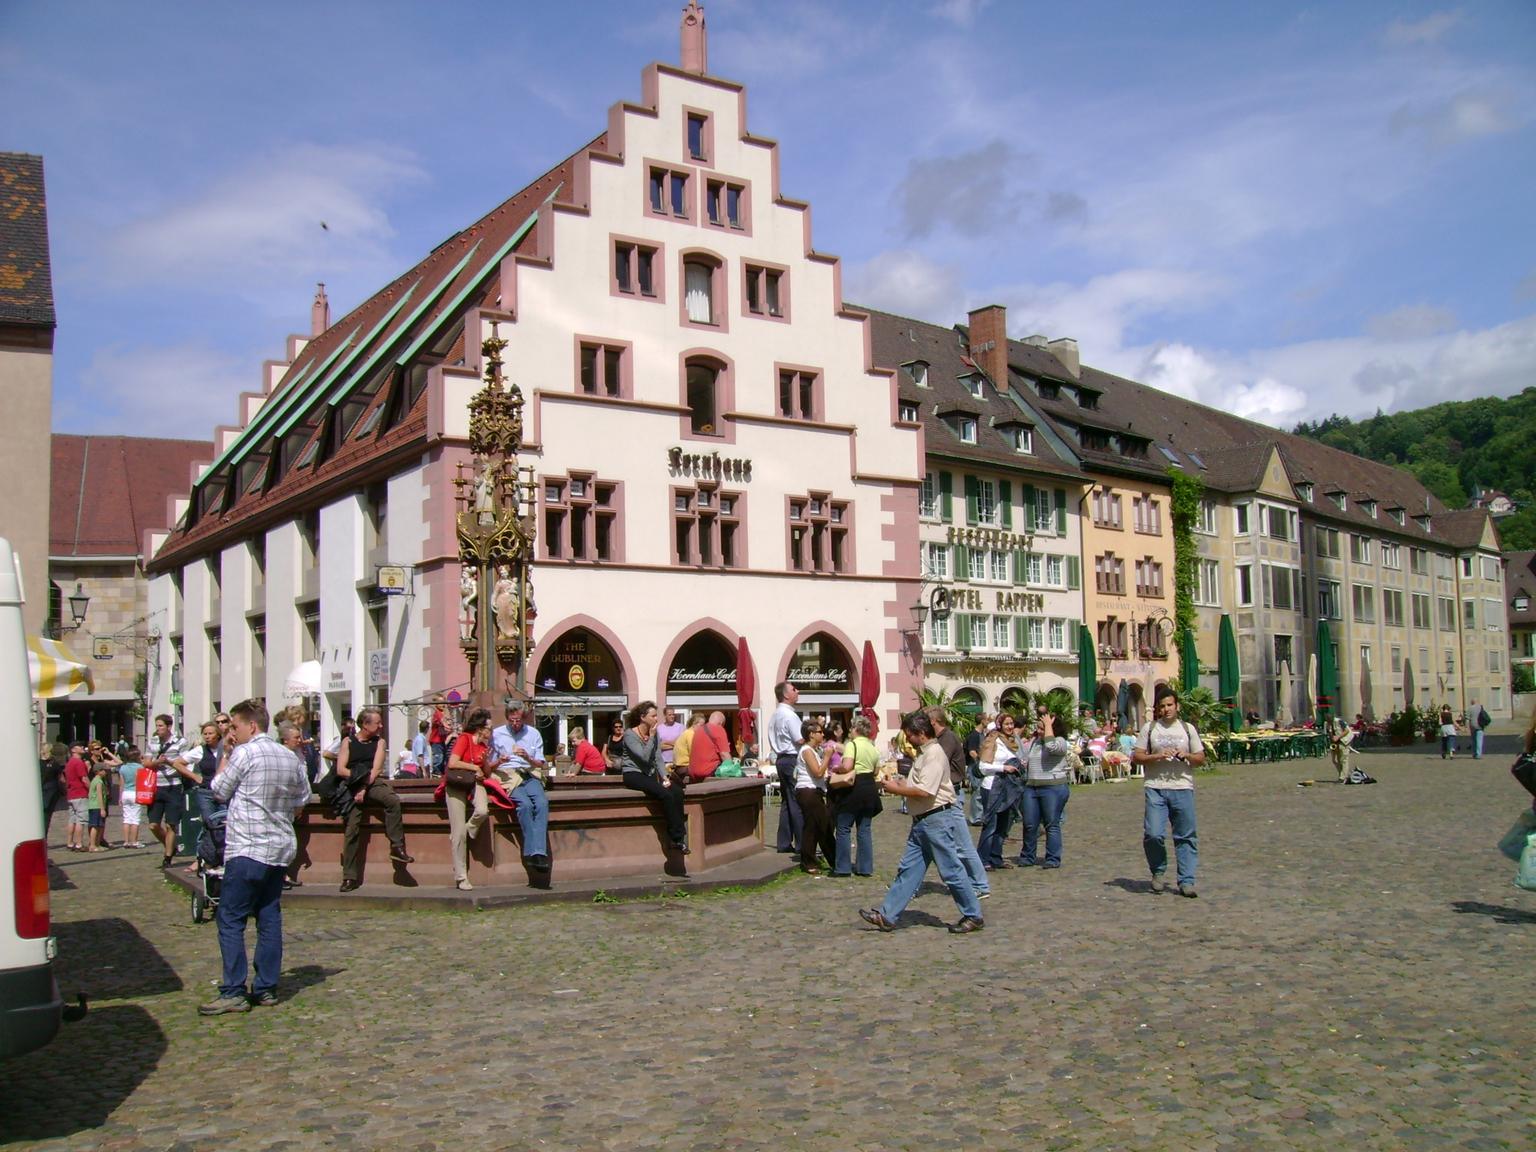 Freiburg im Breisgau Germany  City pictures : Freiburg im Breisgau Freiburg im Breisgau, Germany